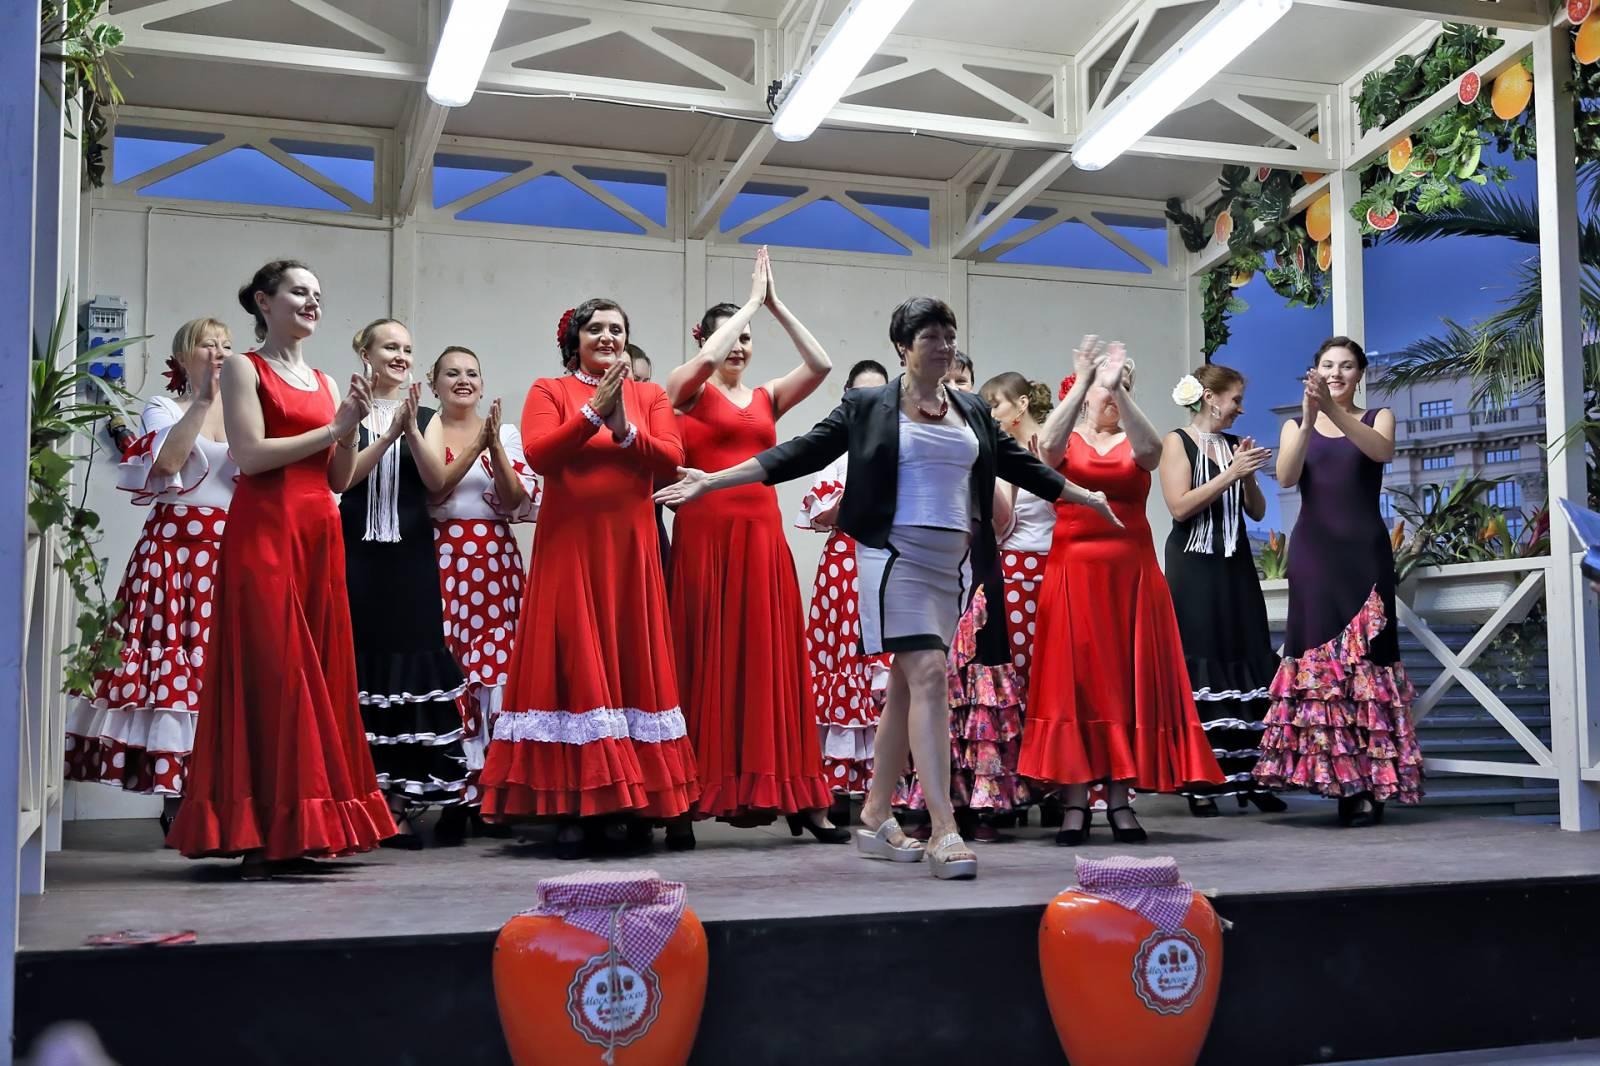 фламенко на фестивале московское варенье